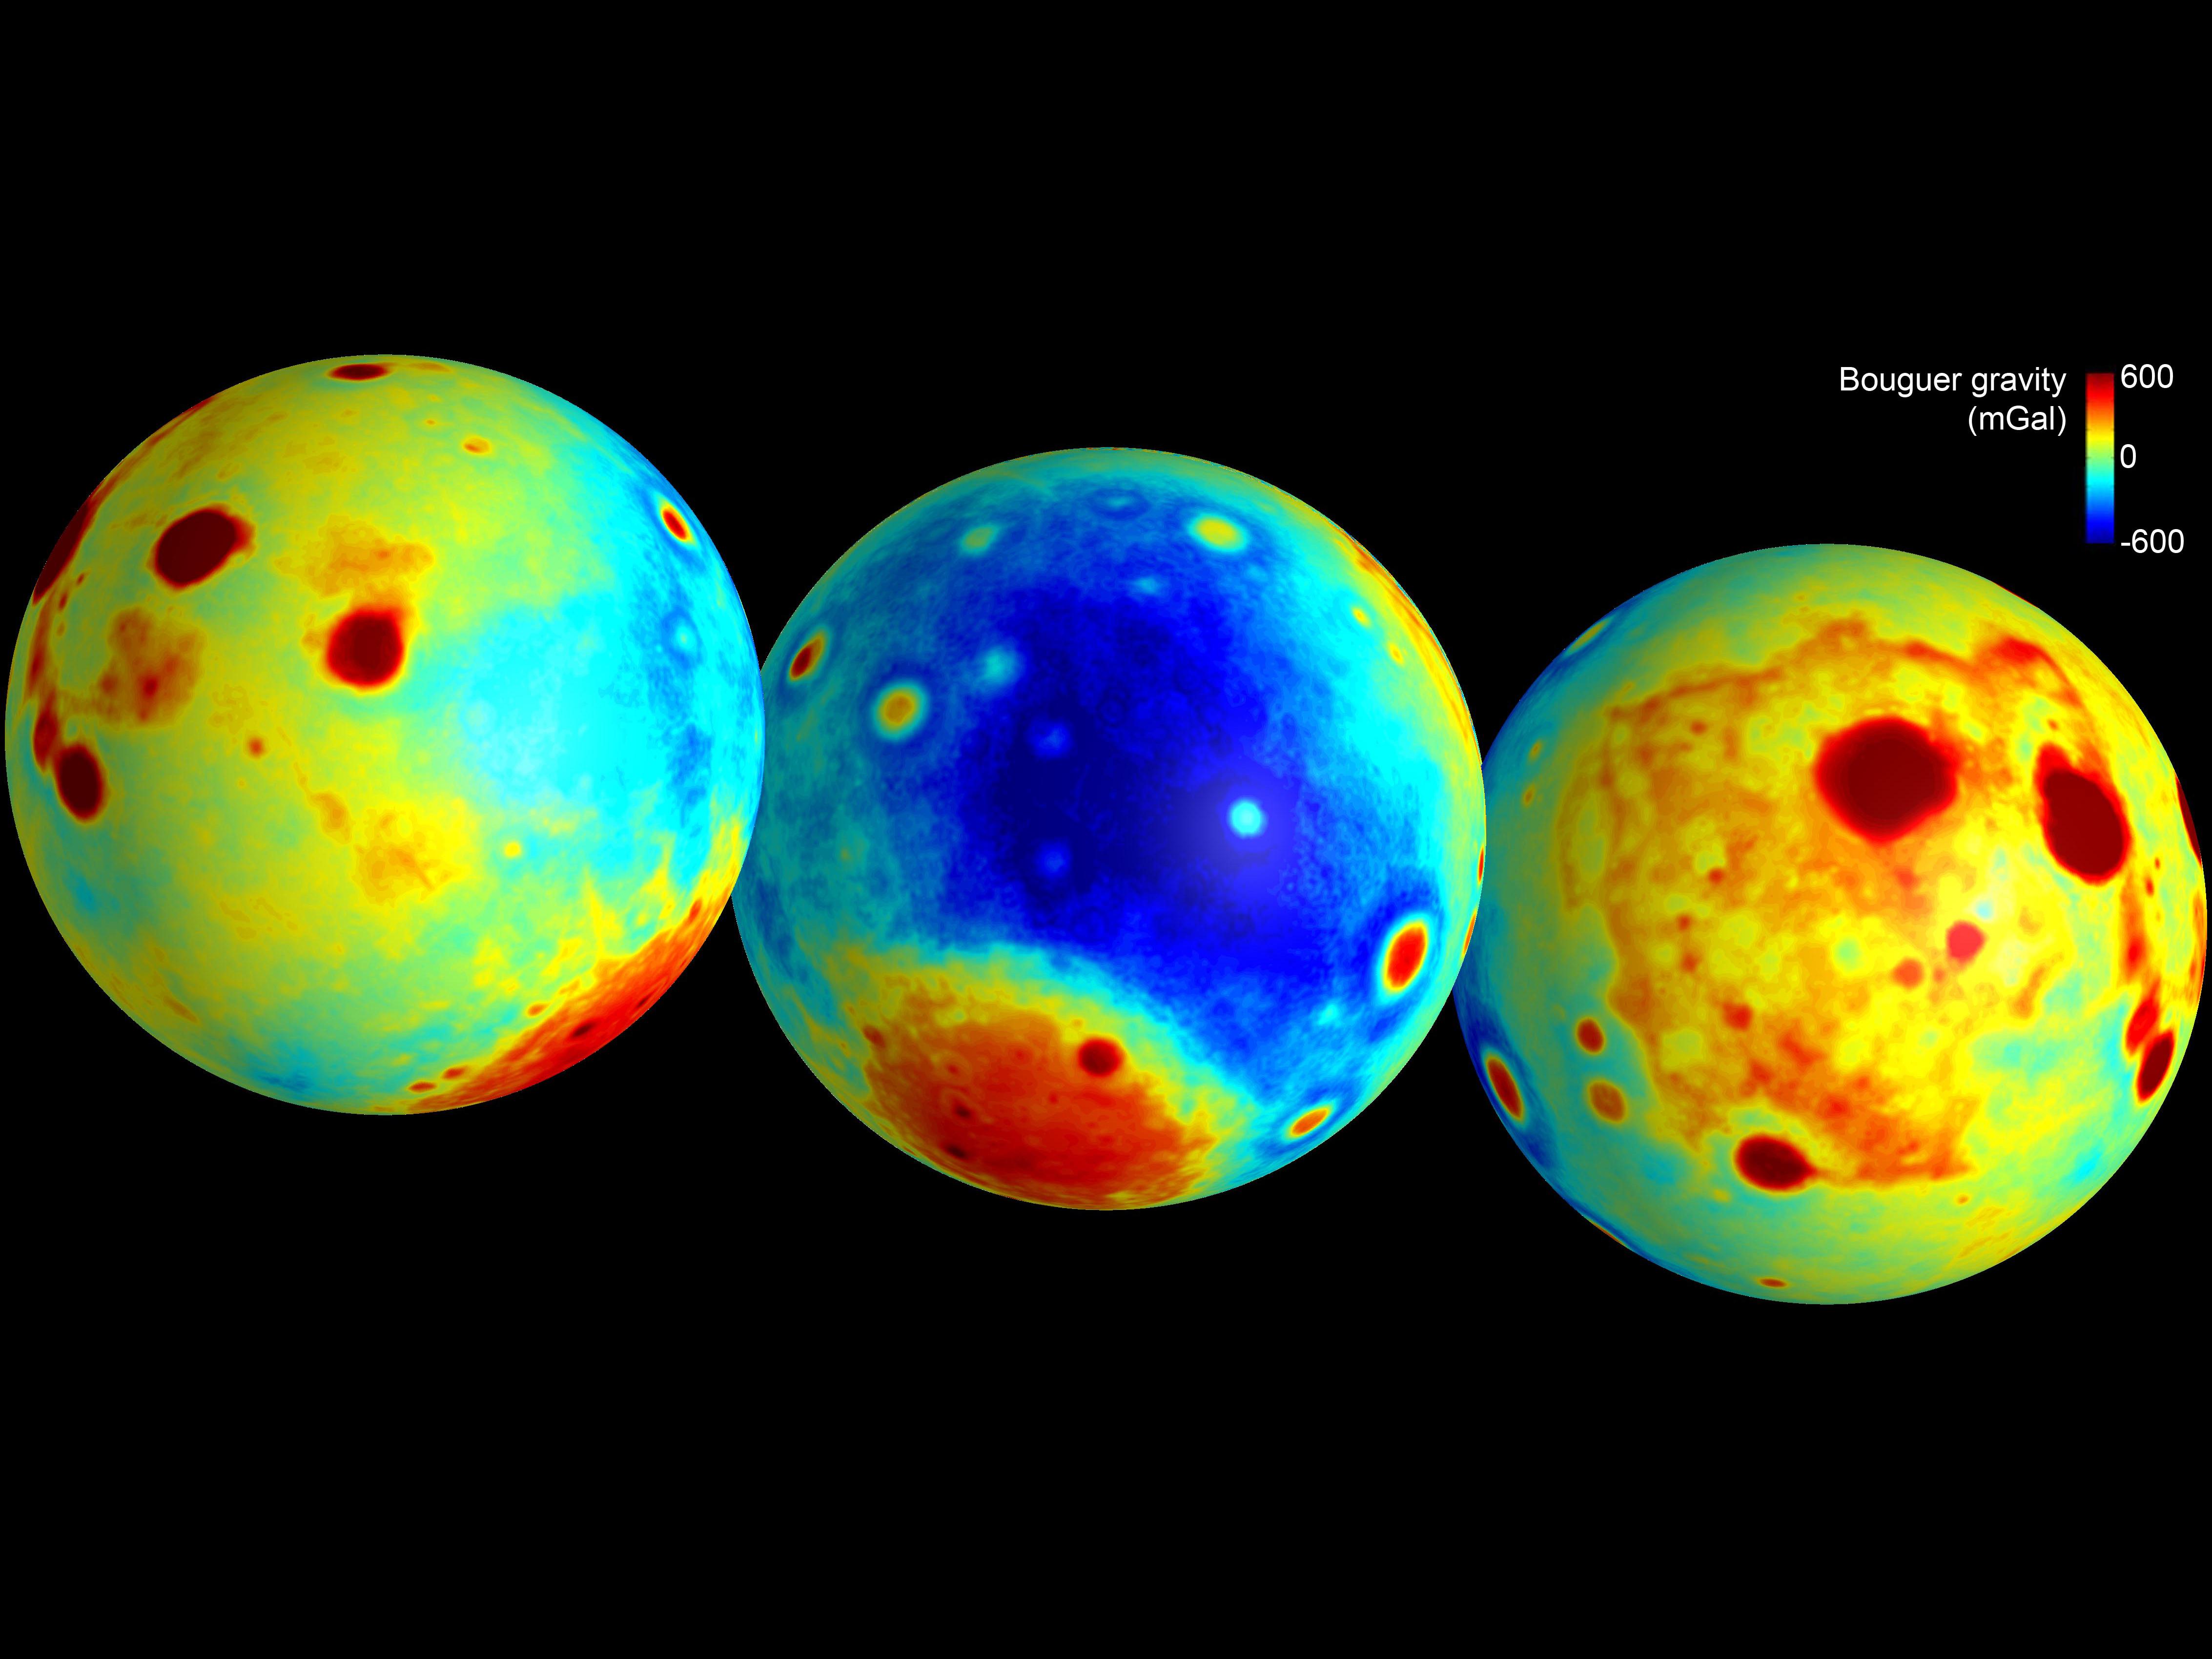 Moon Surprisingly Battered, New Lunar Gravity Map Reveals